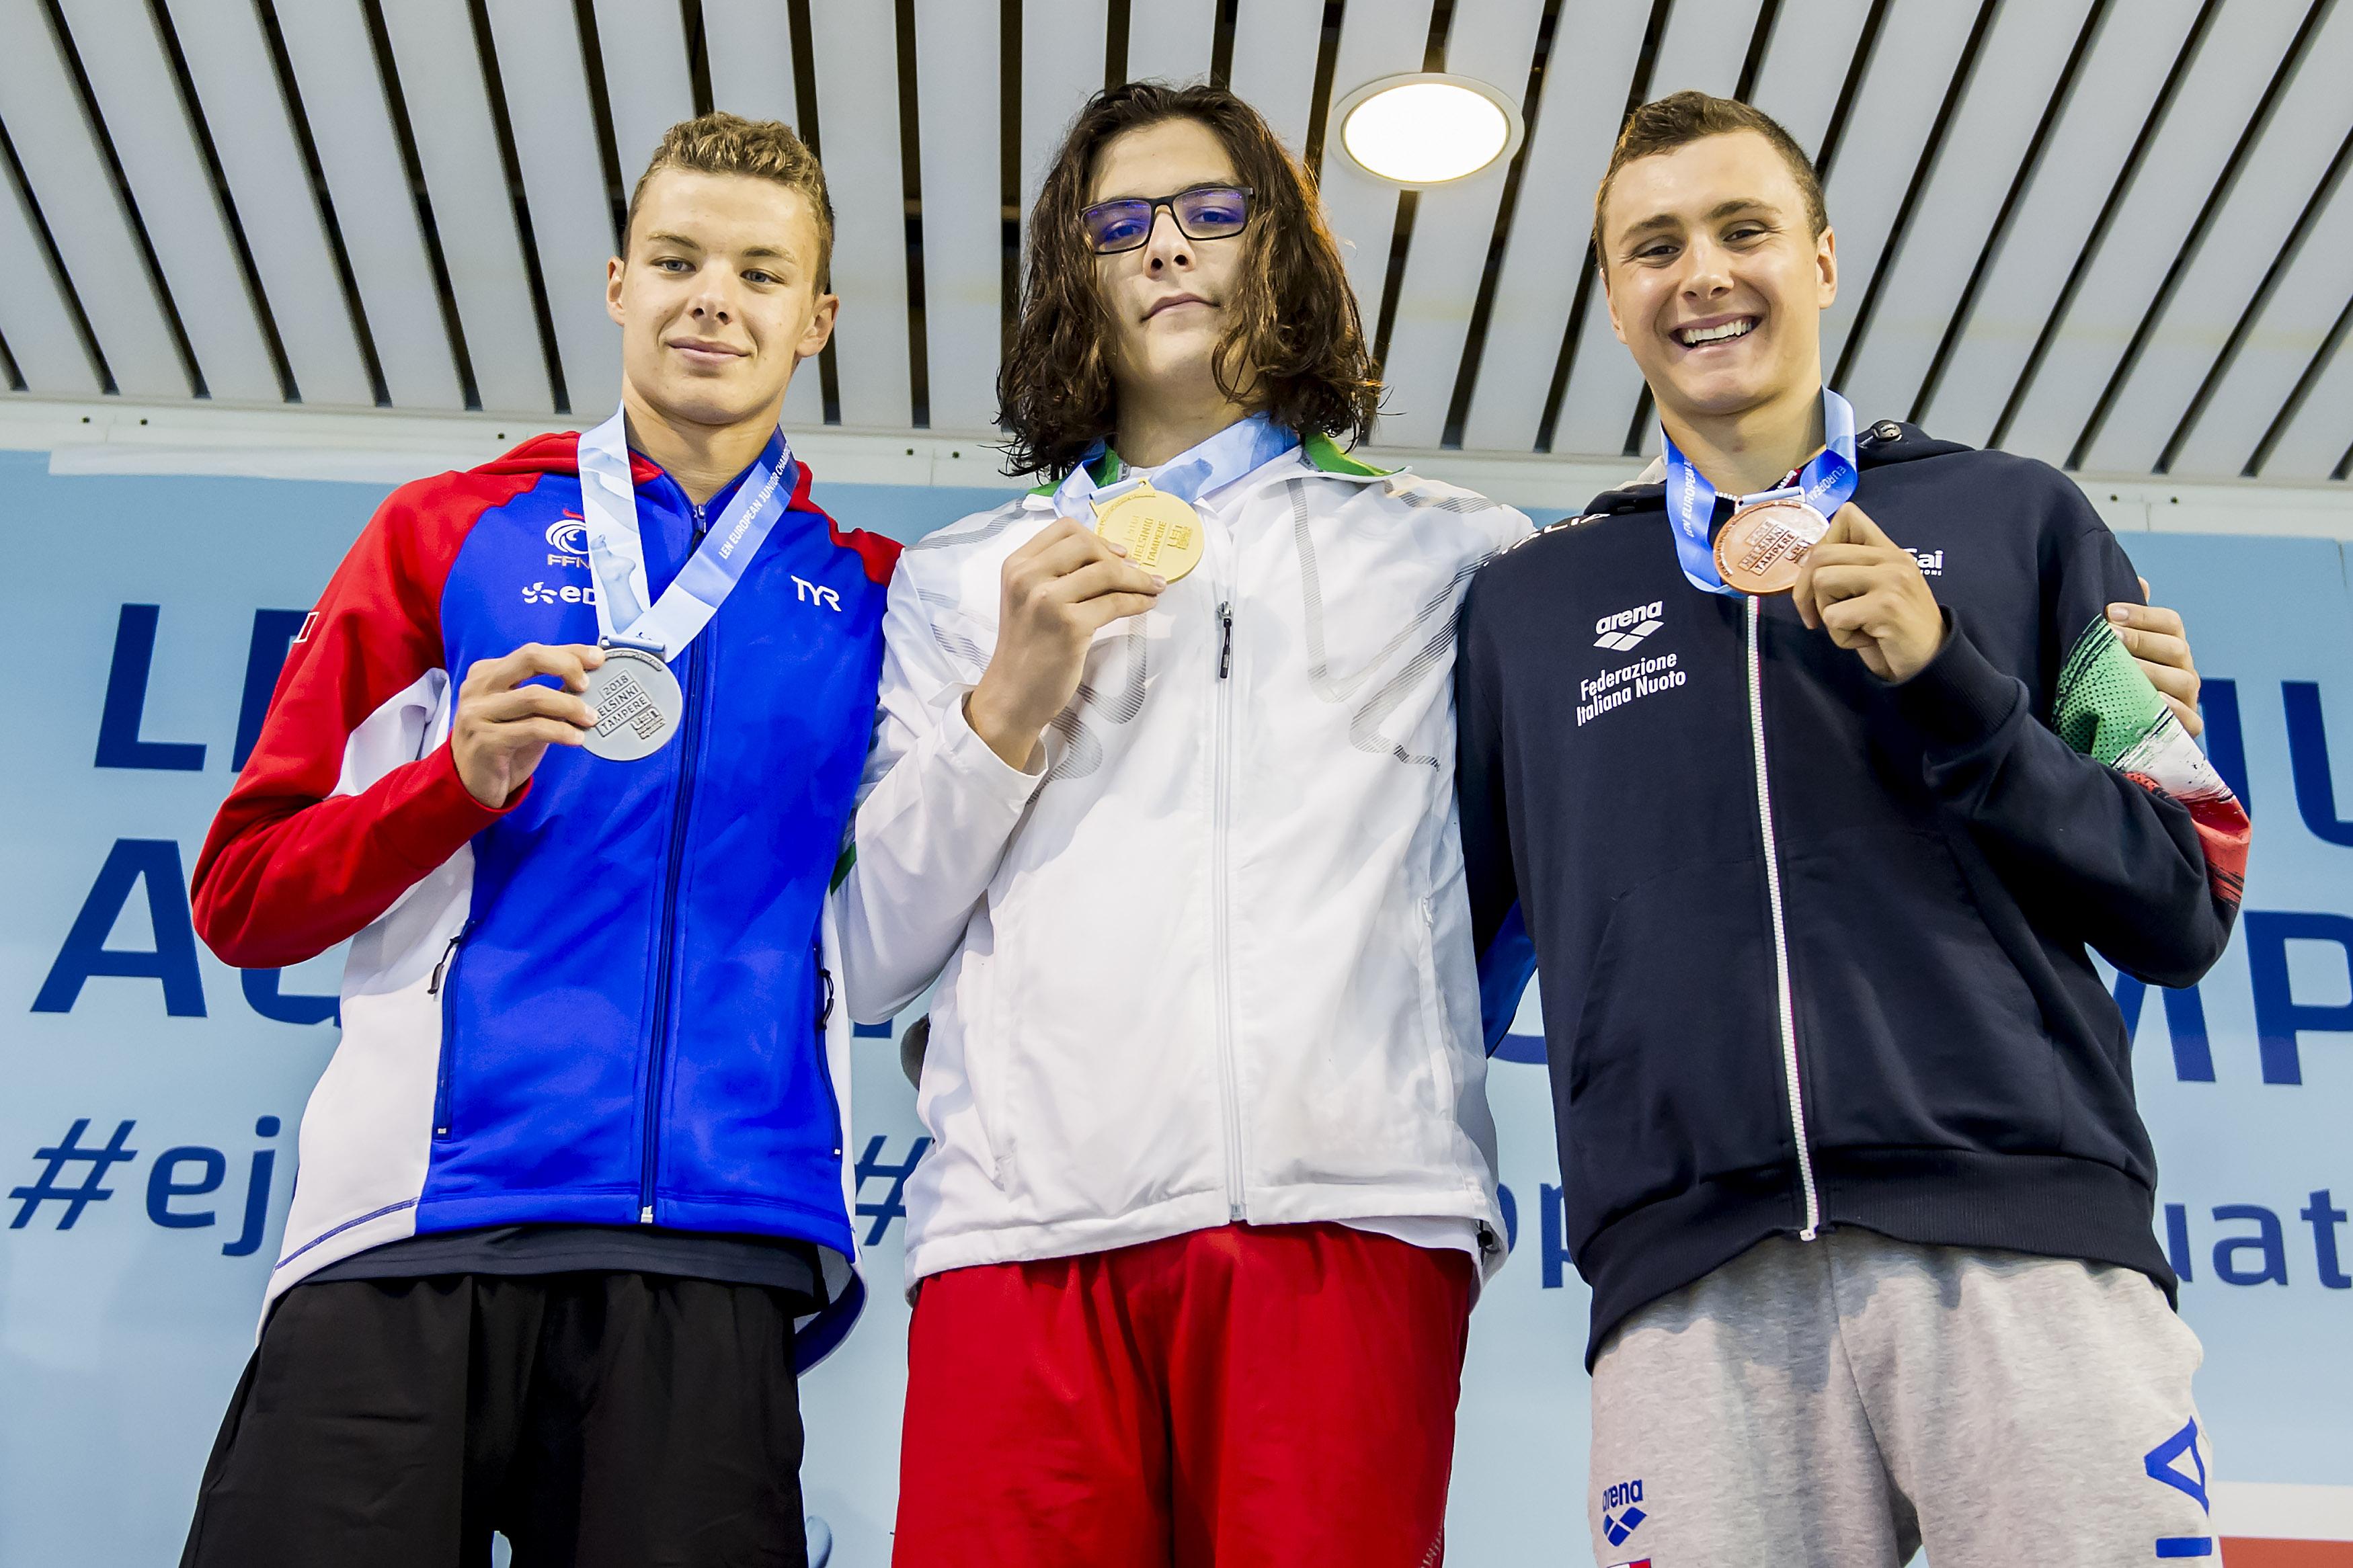 45th European Junior Swimming Championships, Podium